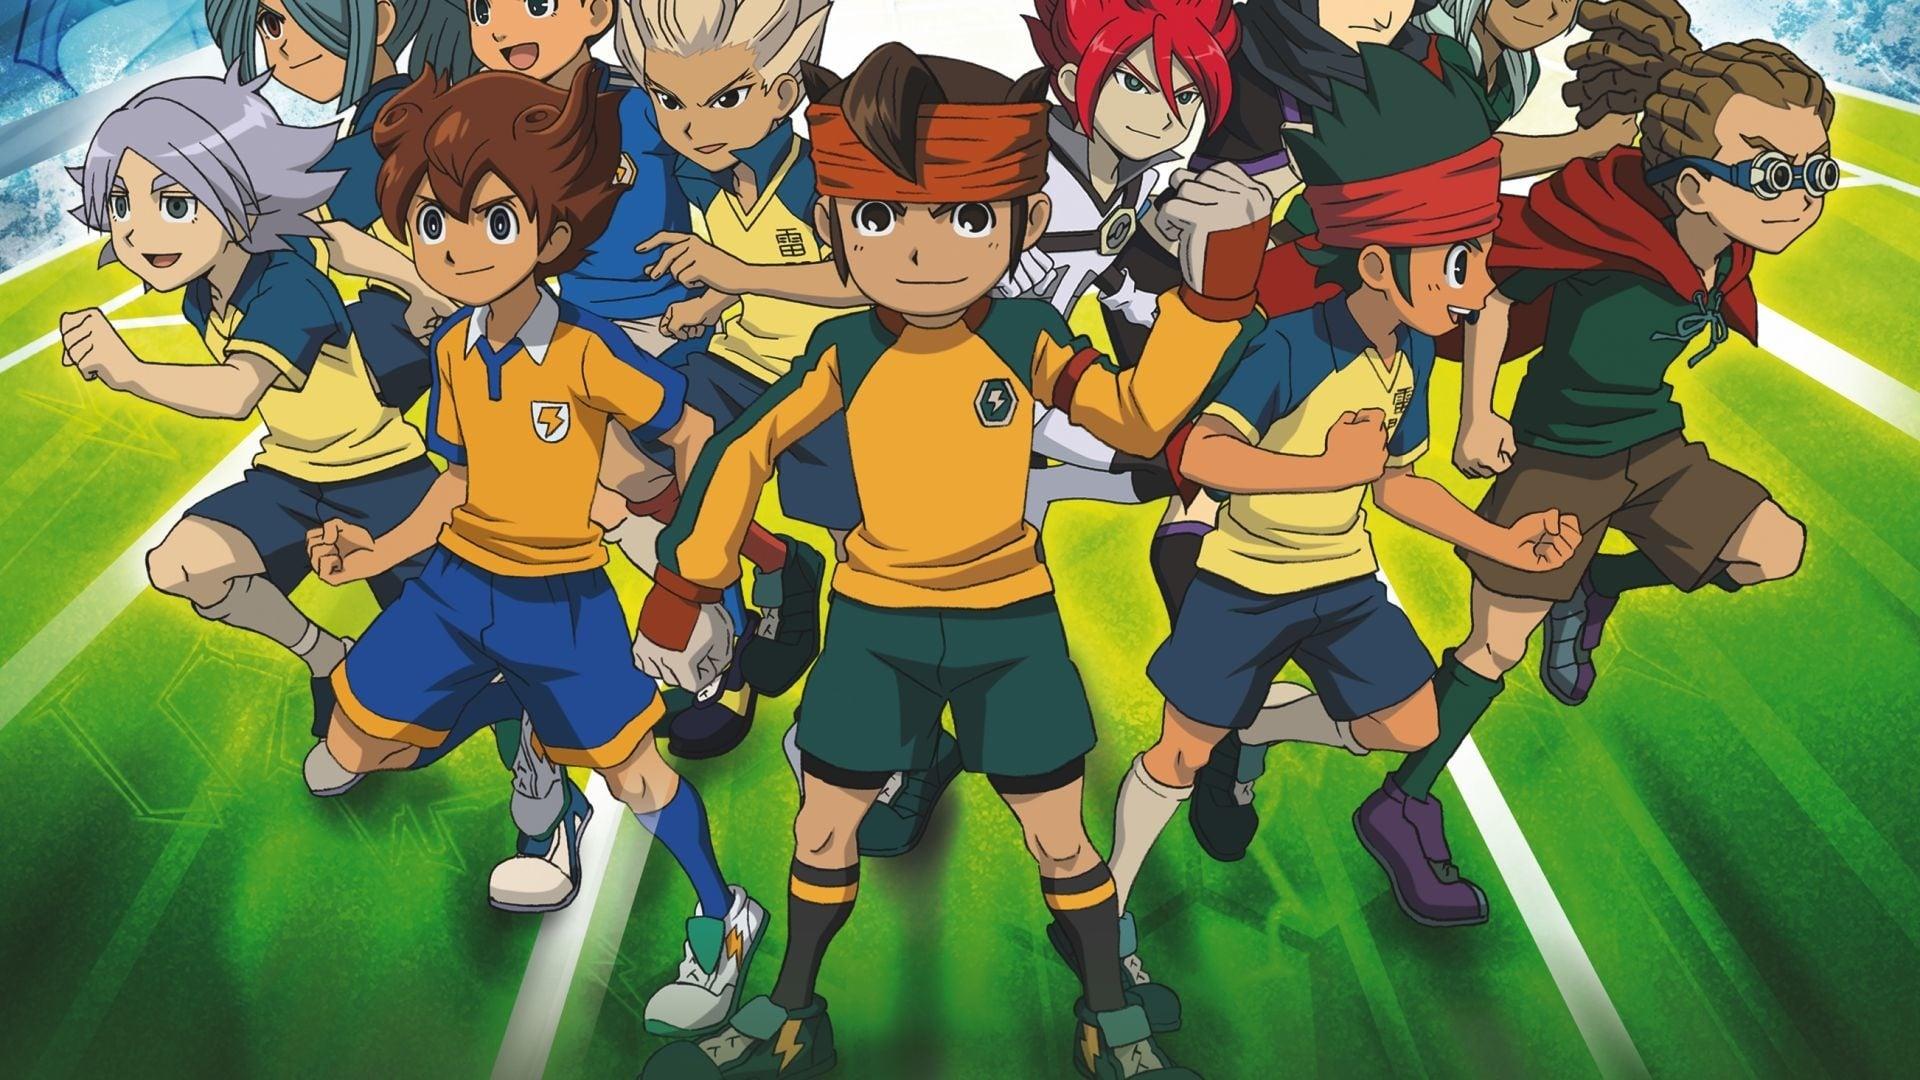 Regarder Anime Complet En Streaming VF Et